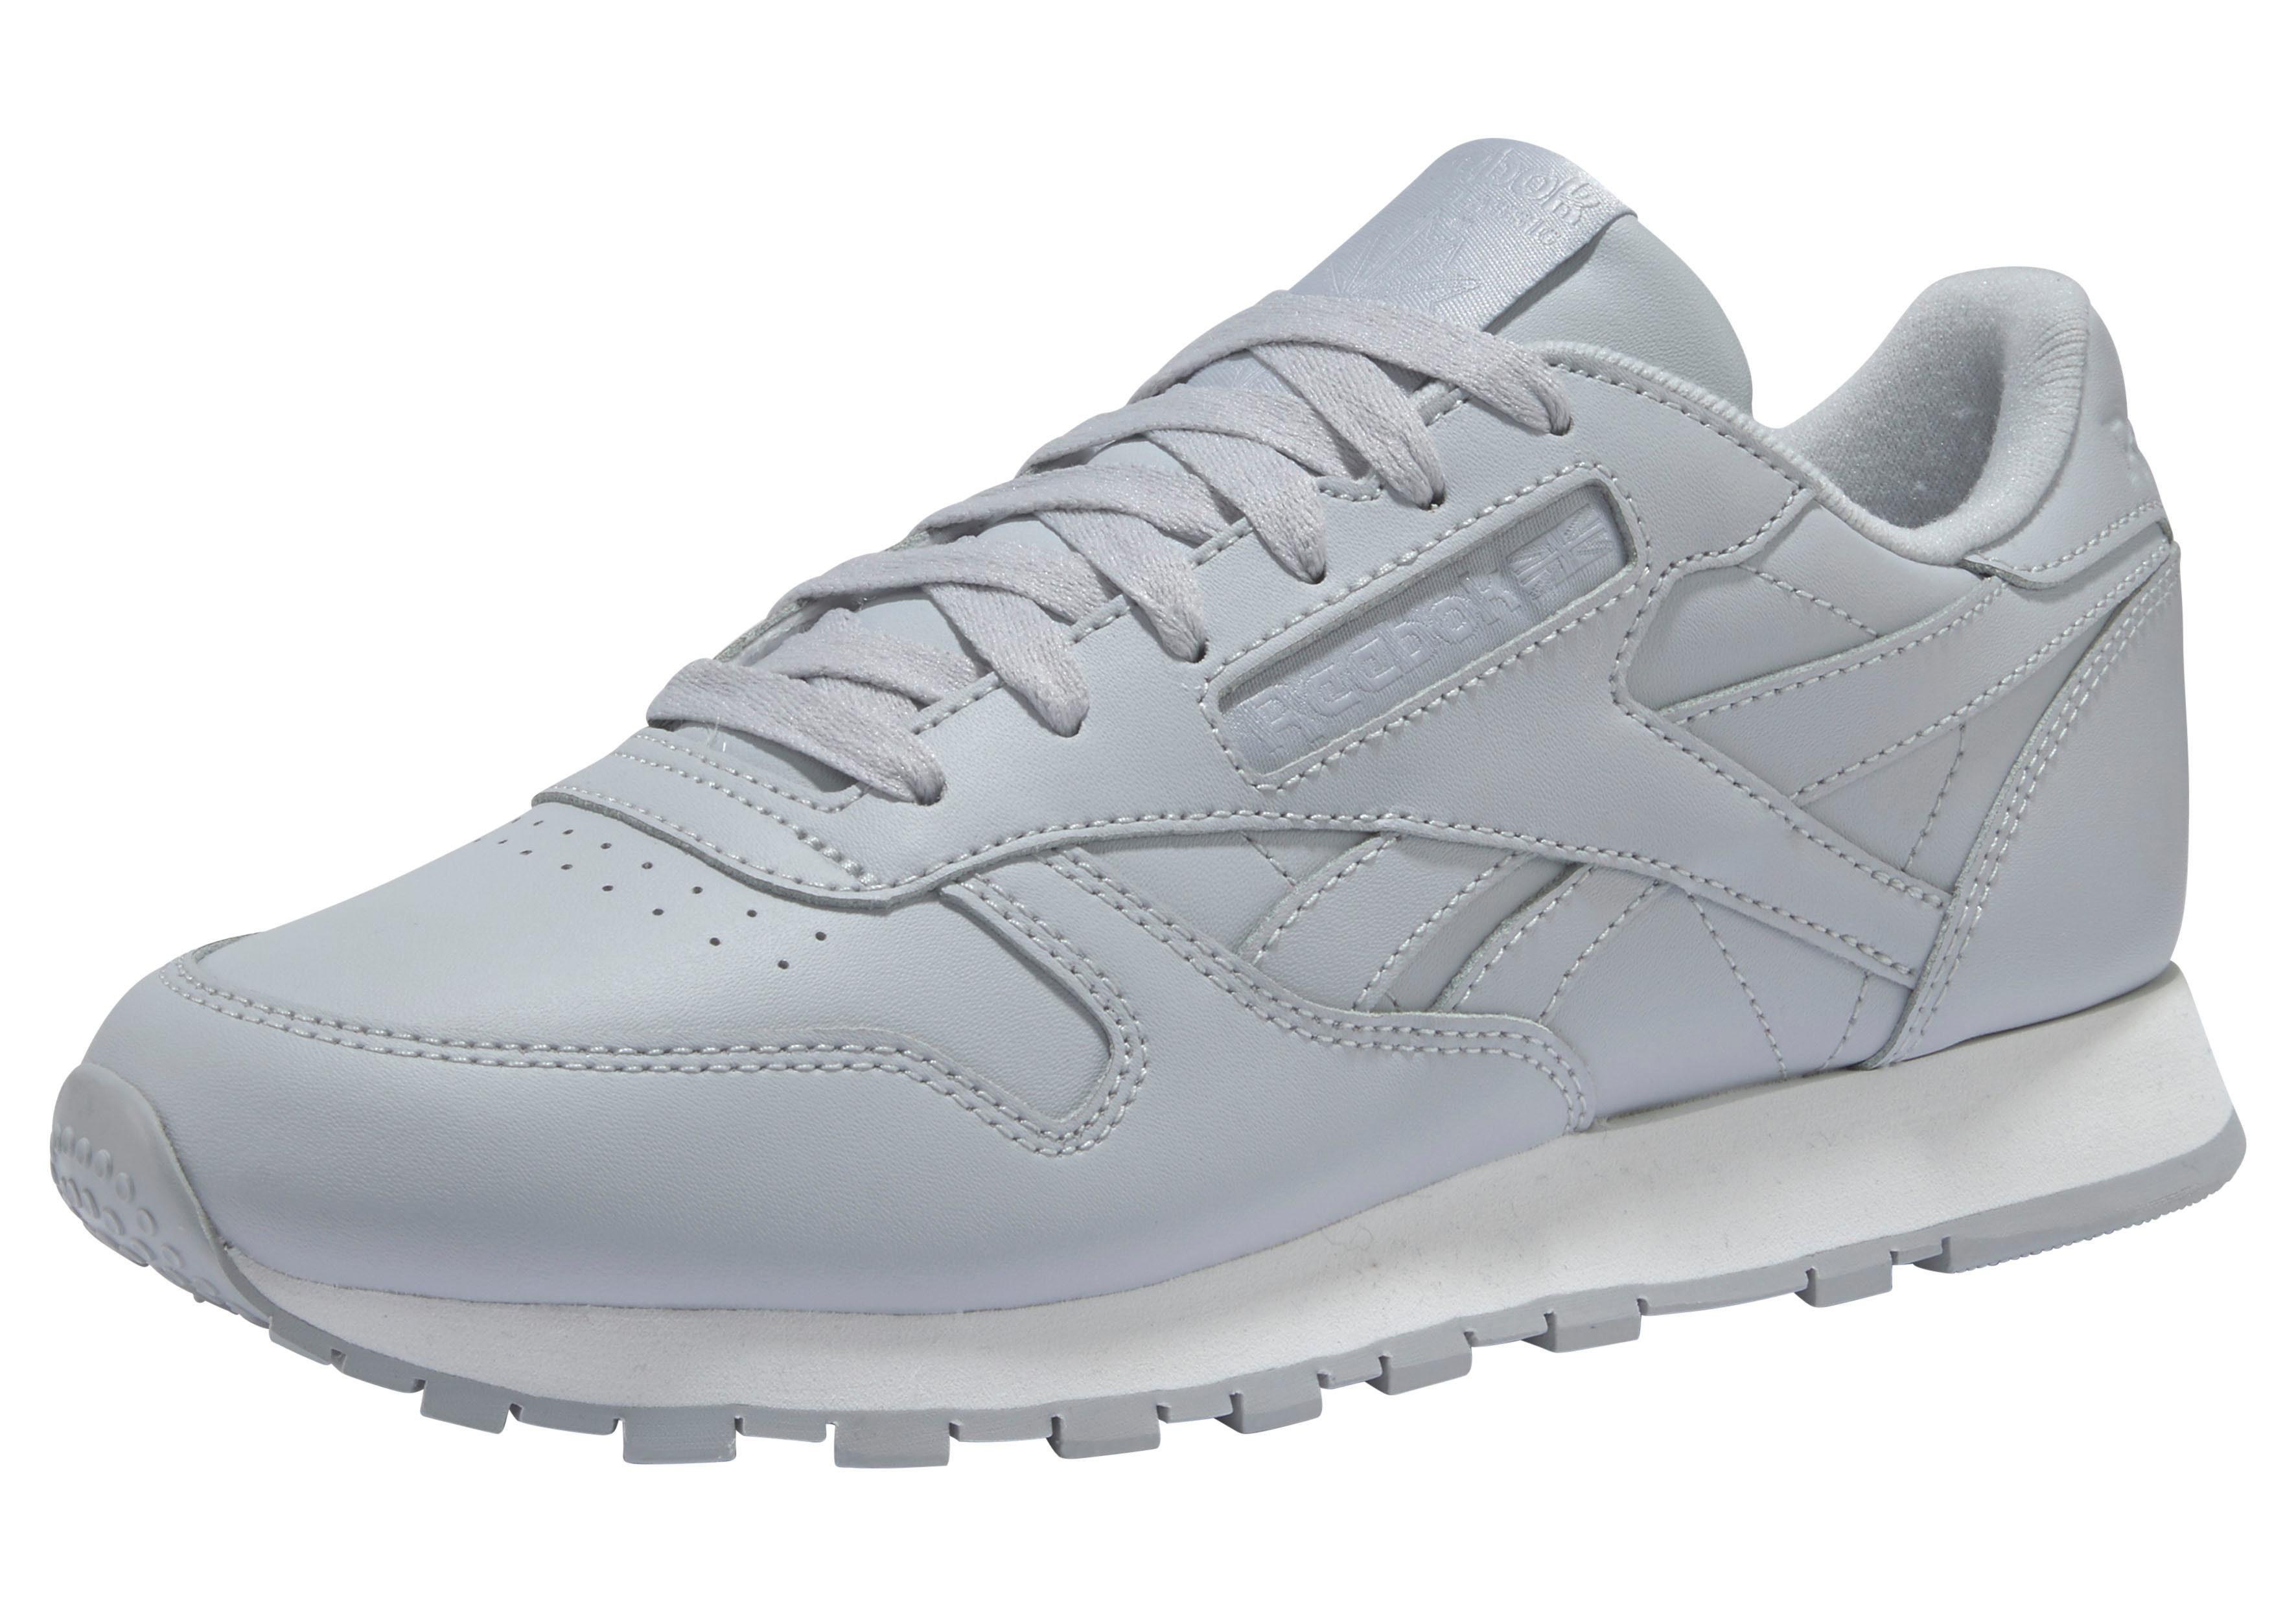 Billig Reebok Damen Sneaker Reebok Classic Leather Satin